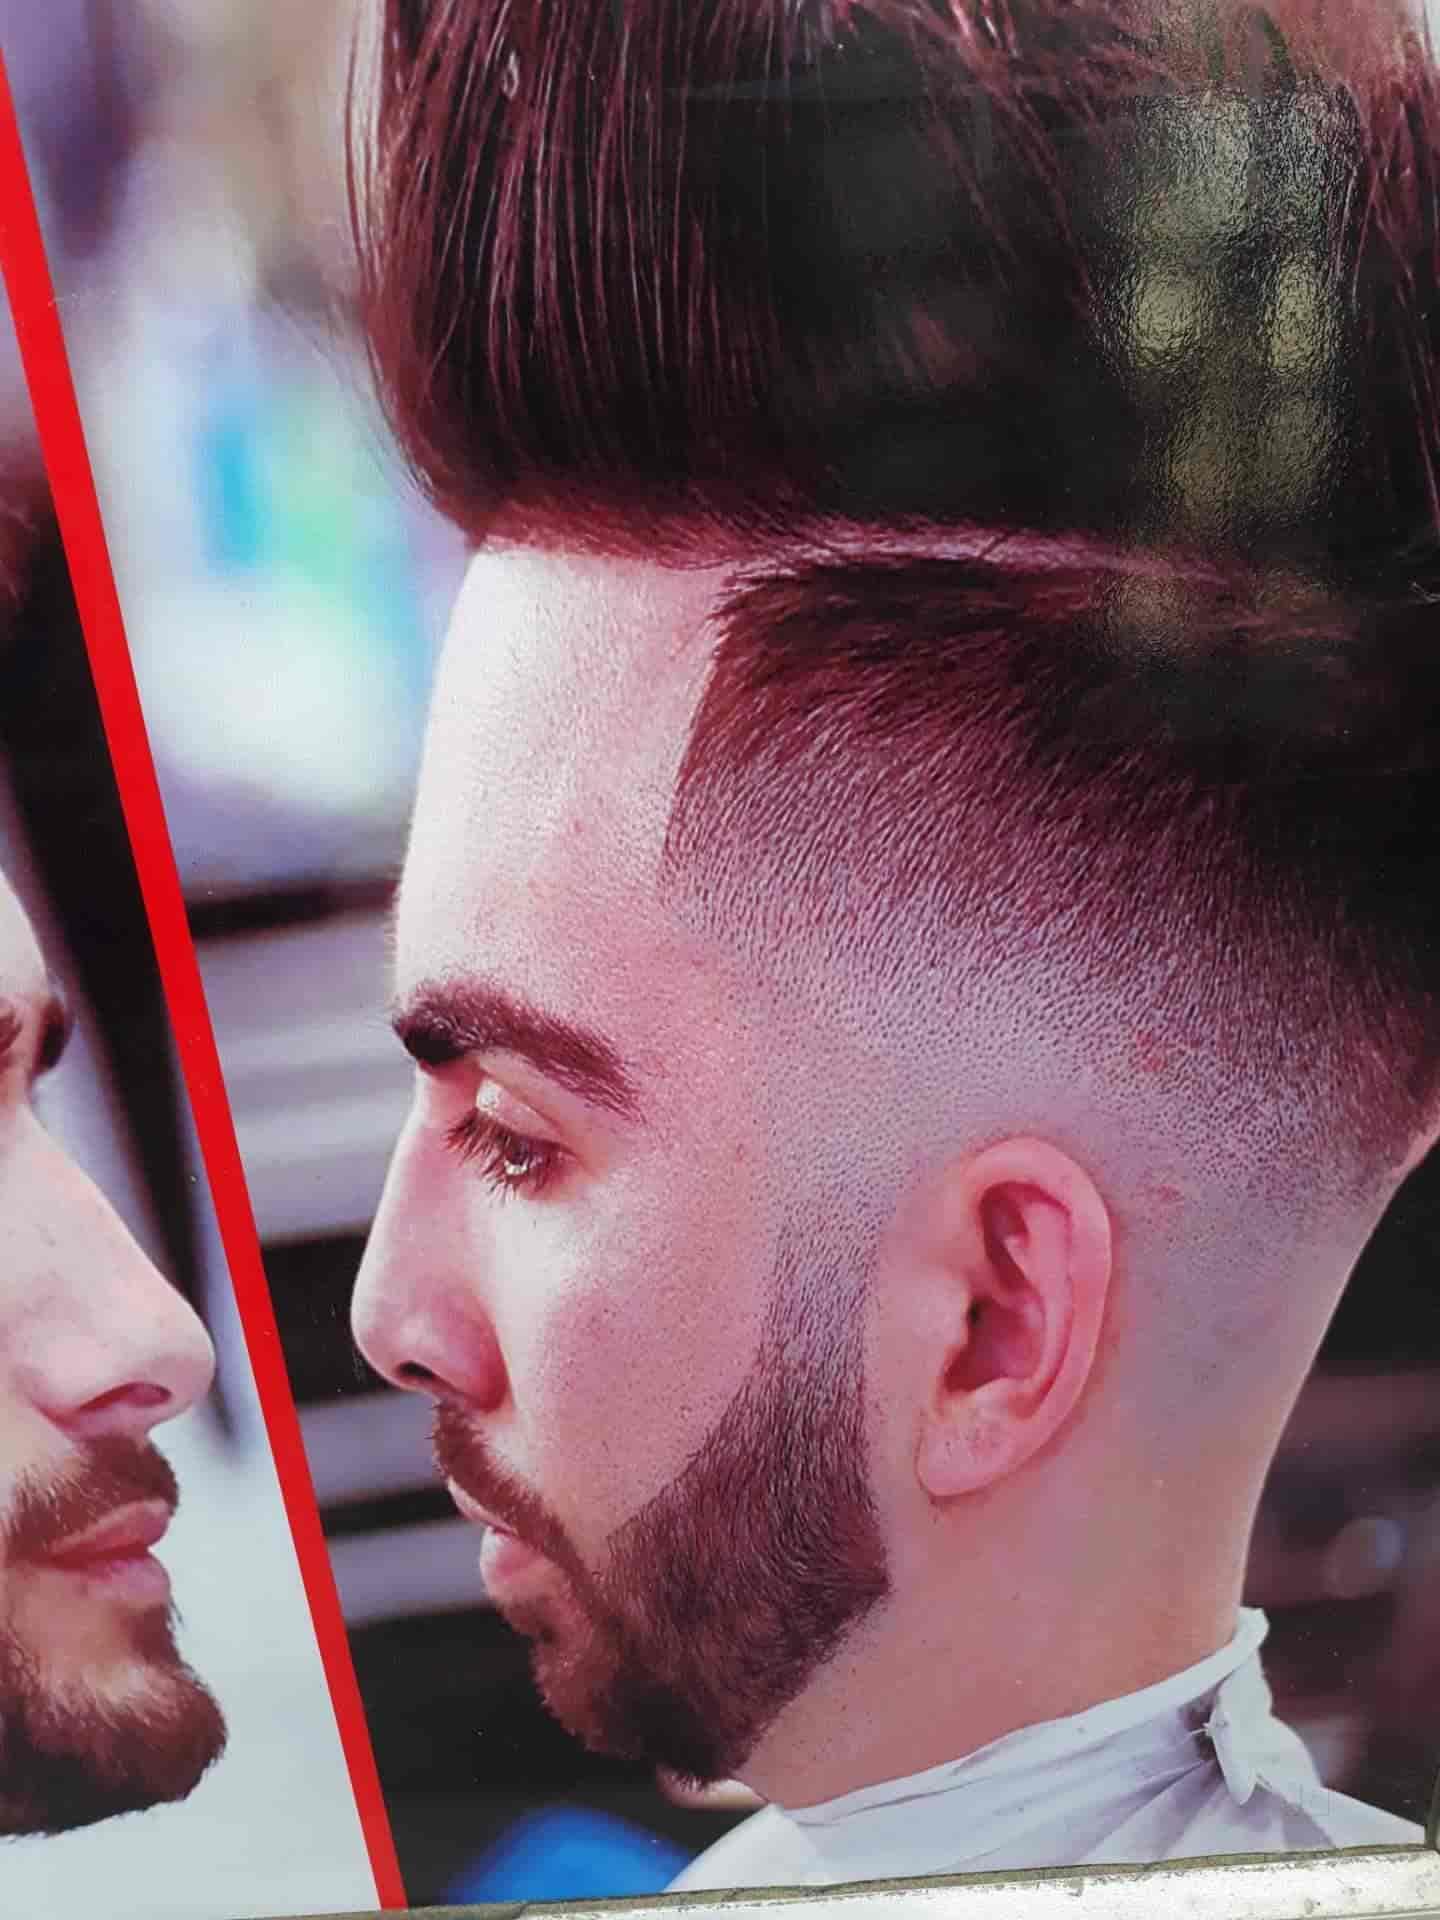 Laser Hair Cut Salon Uday Tower Vijant Khand Beauty Spas In Lucknow Lucknow Justdial